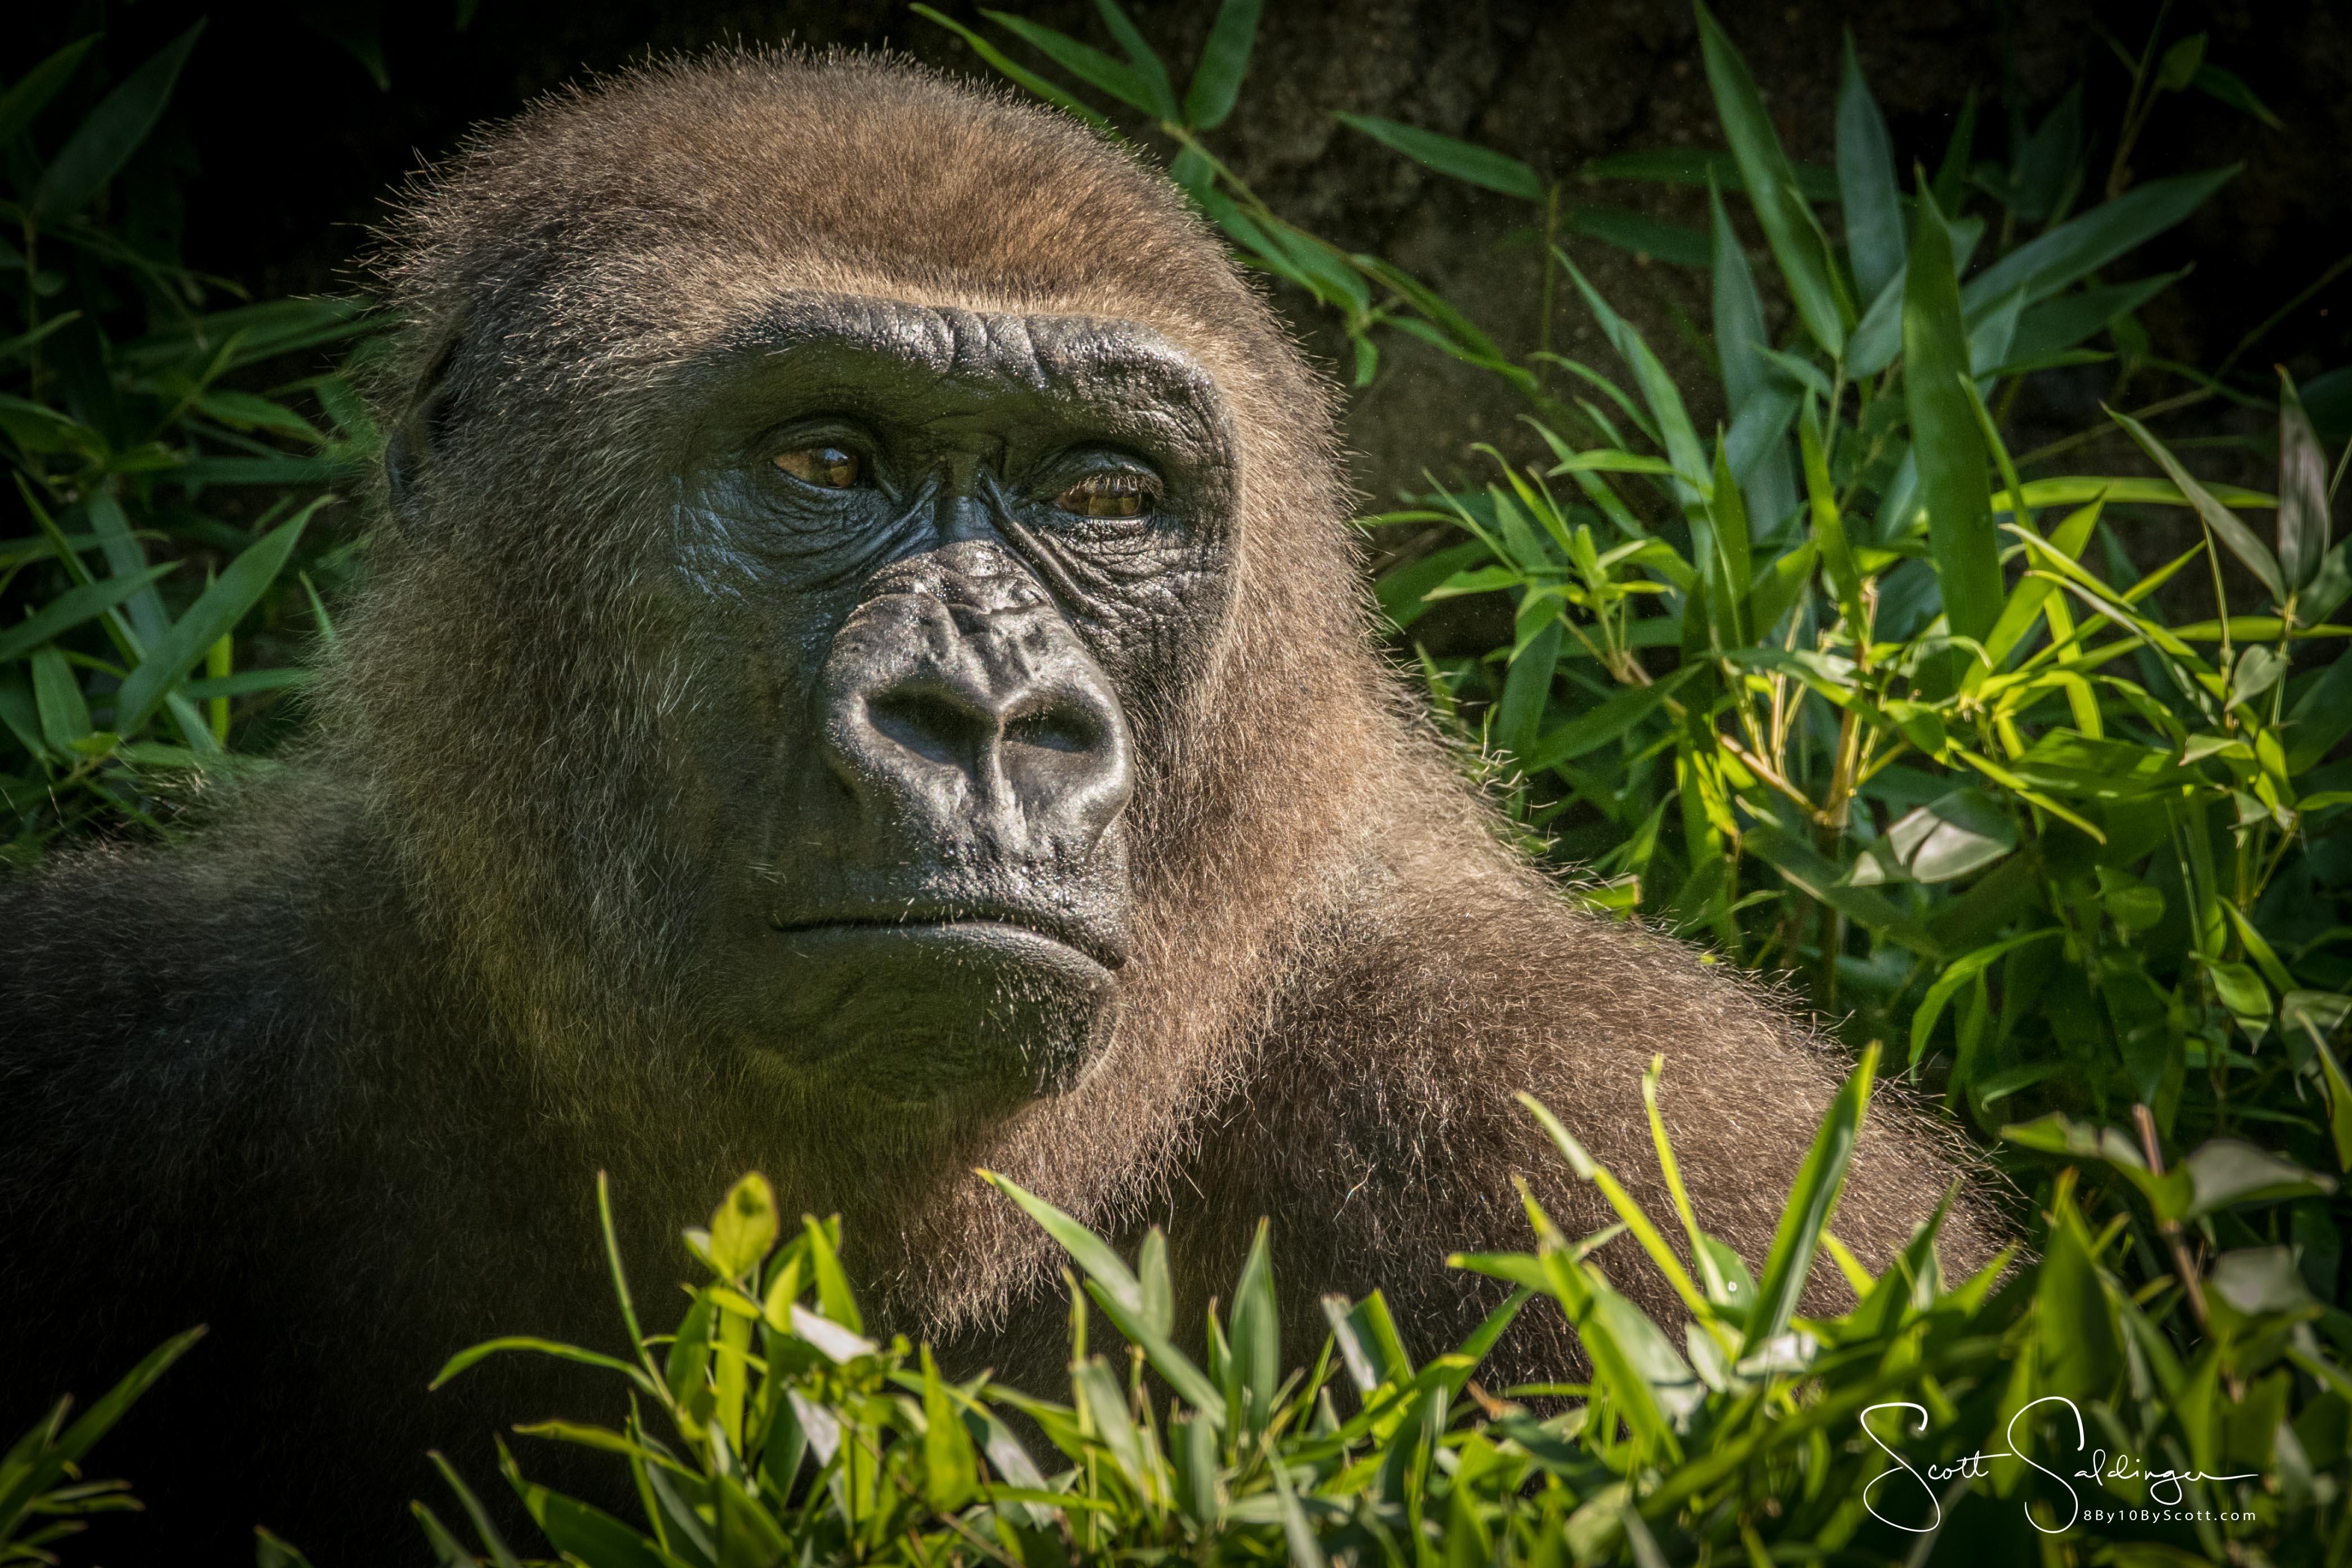 Apes-5793